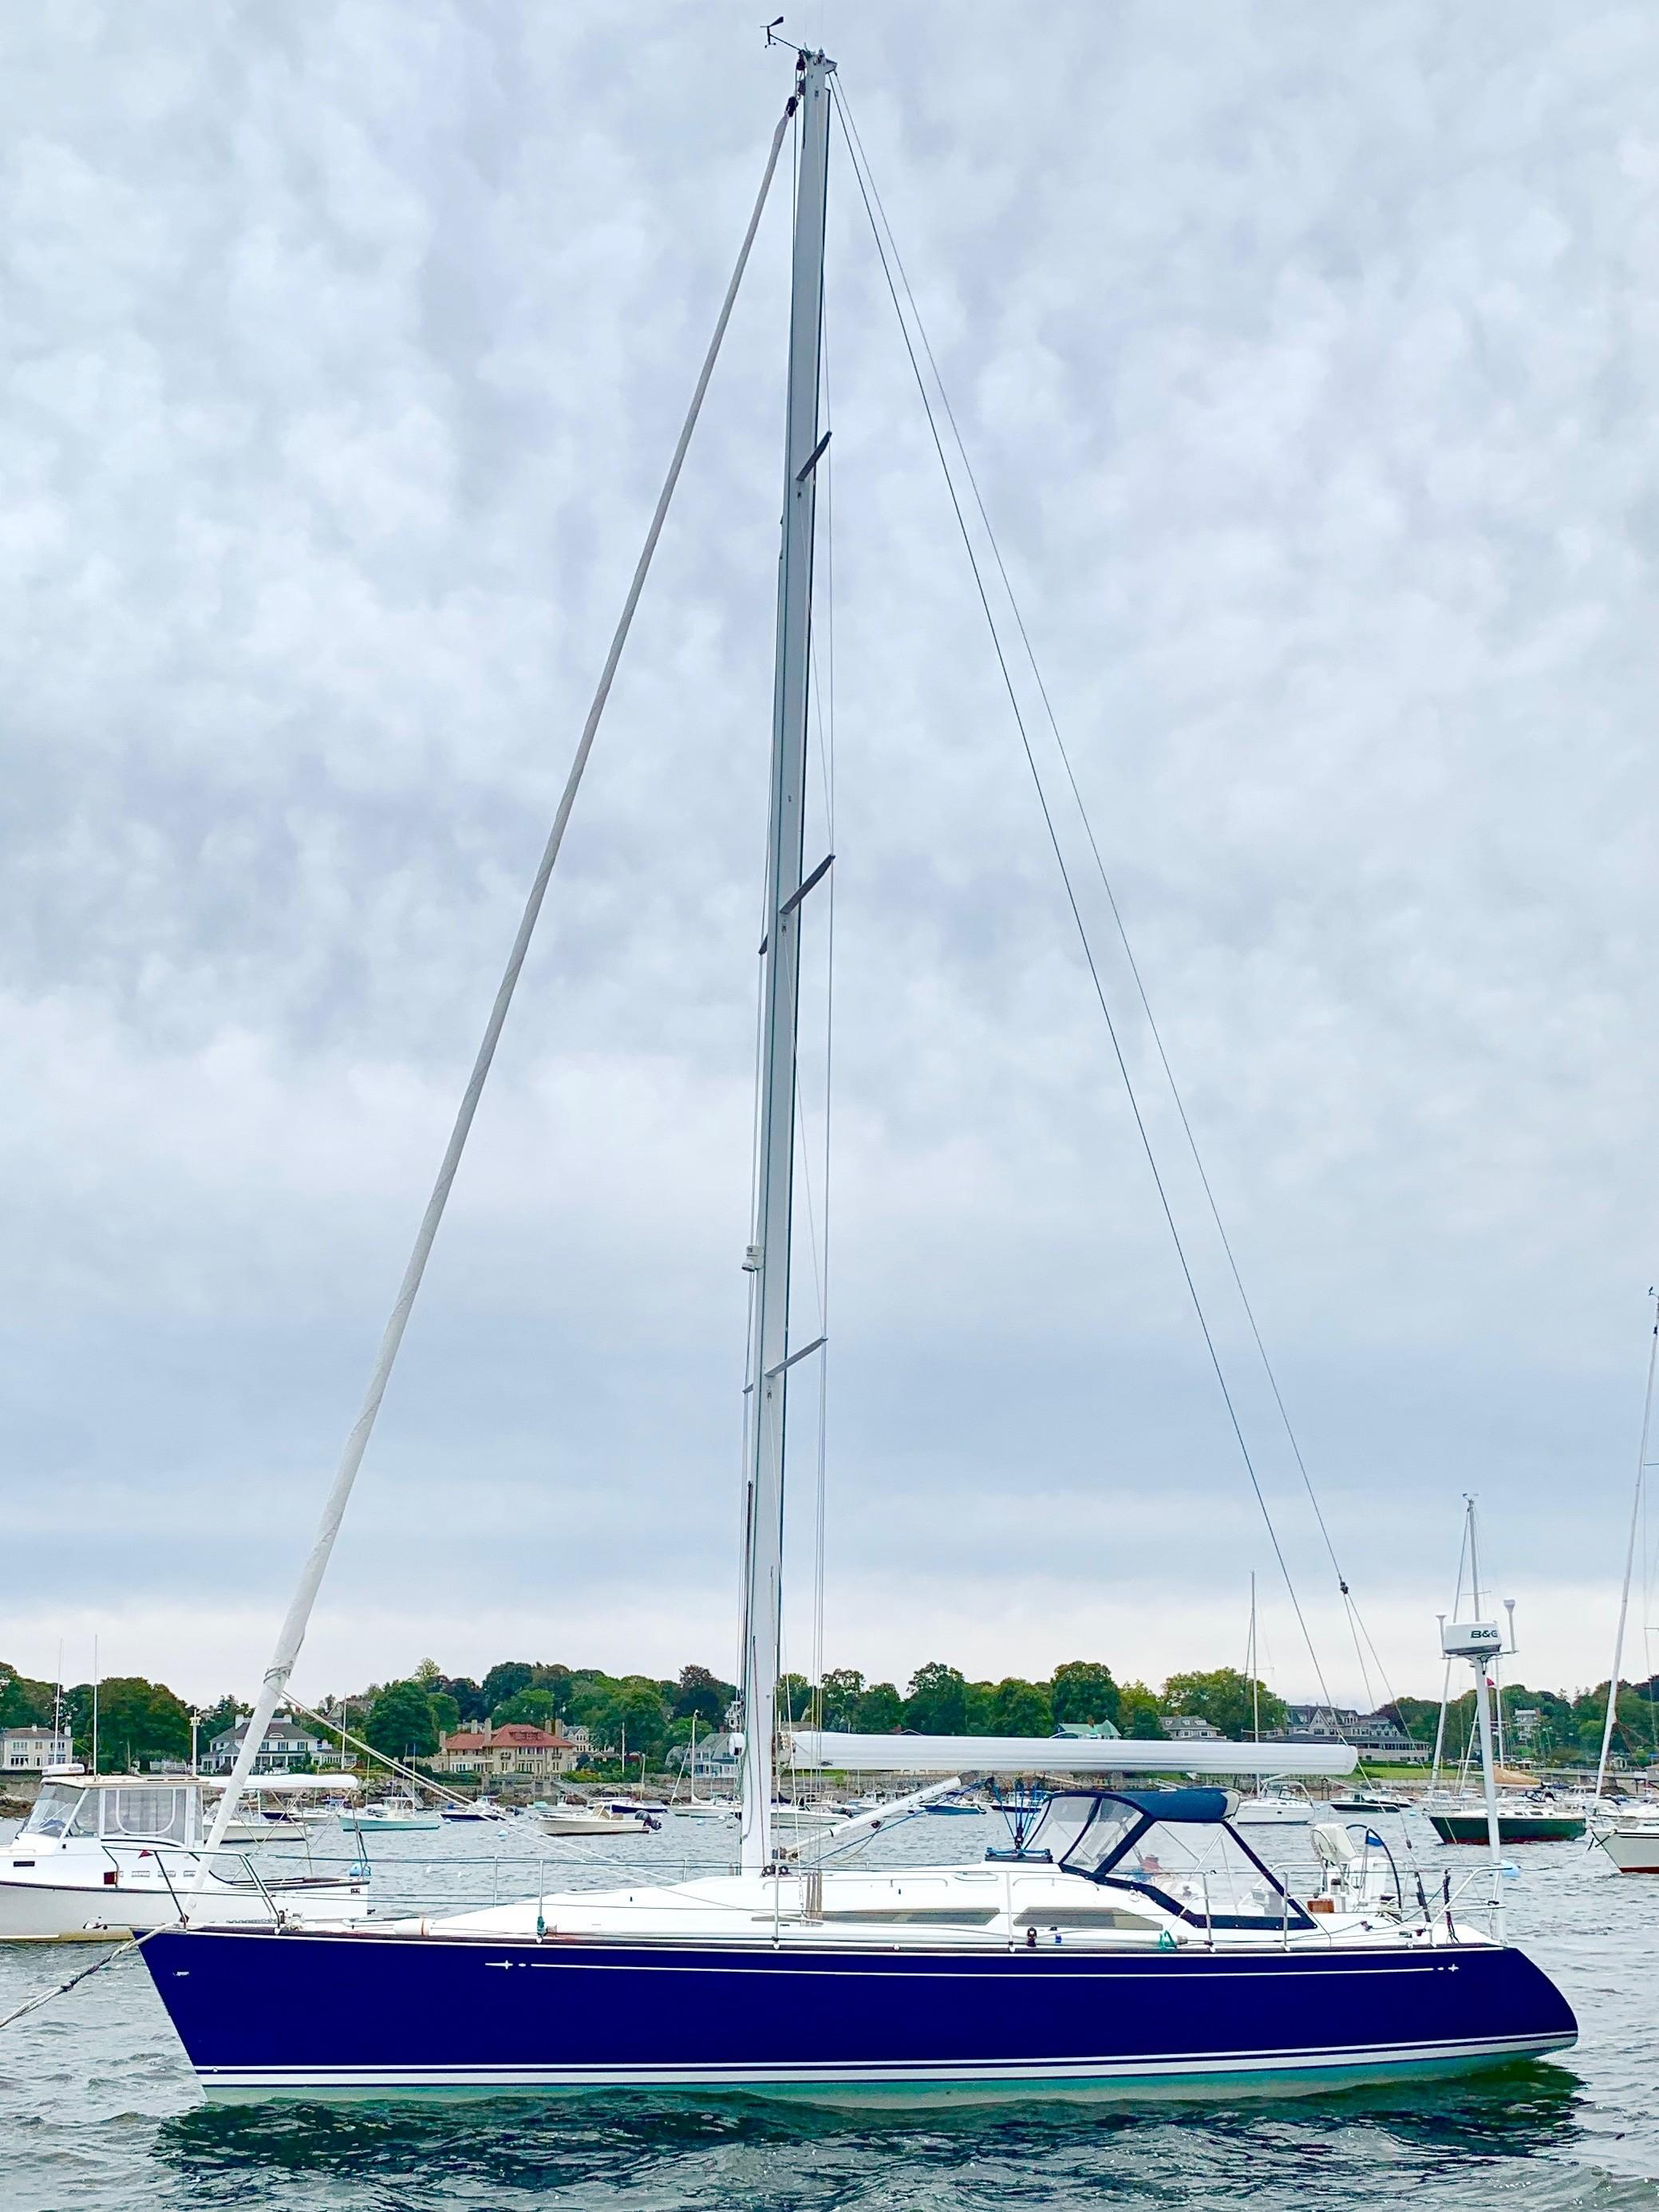 40 ft C&C 121 Full Provile